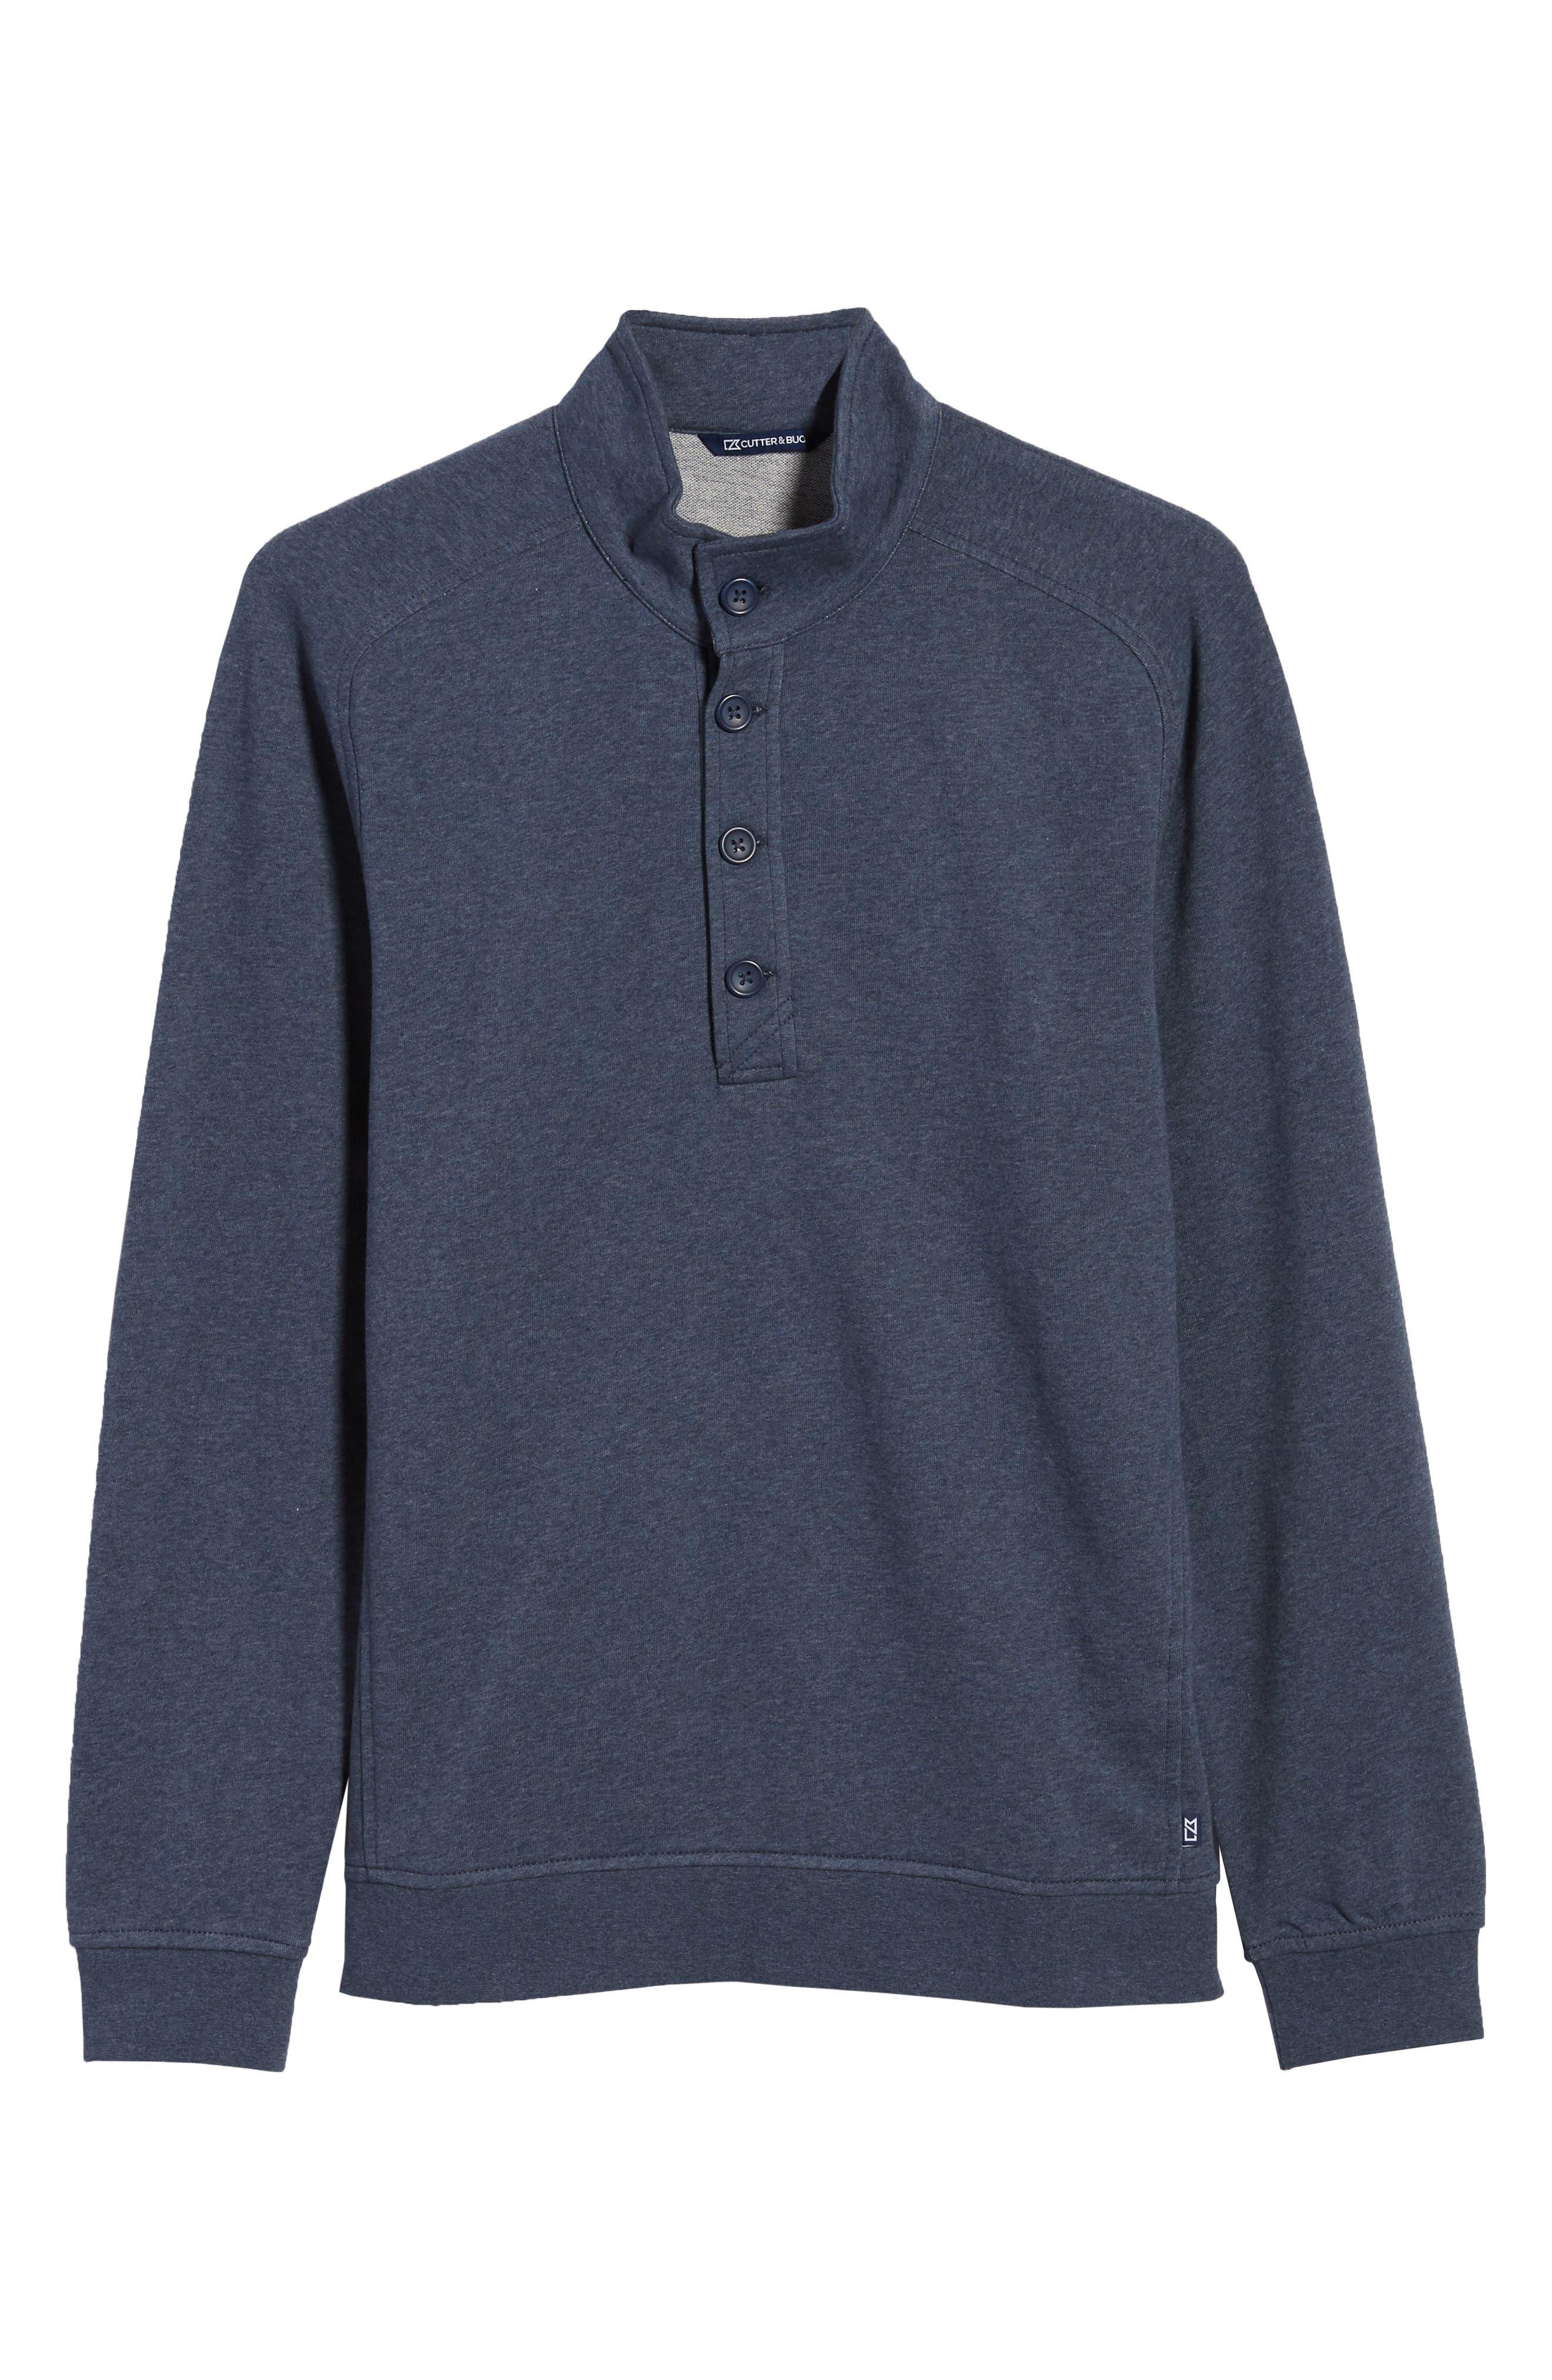 Saturday Mock Neck Sweatshirt